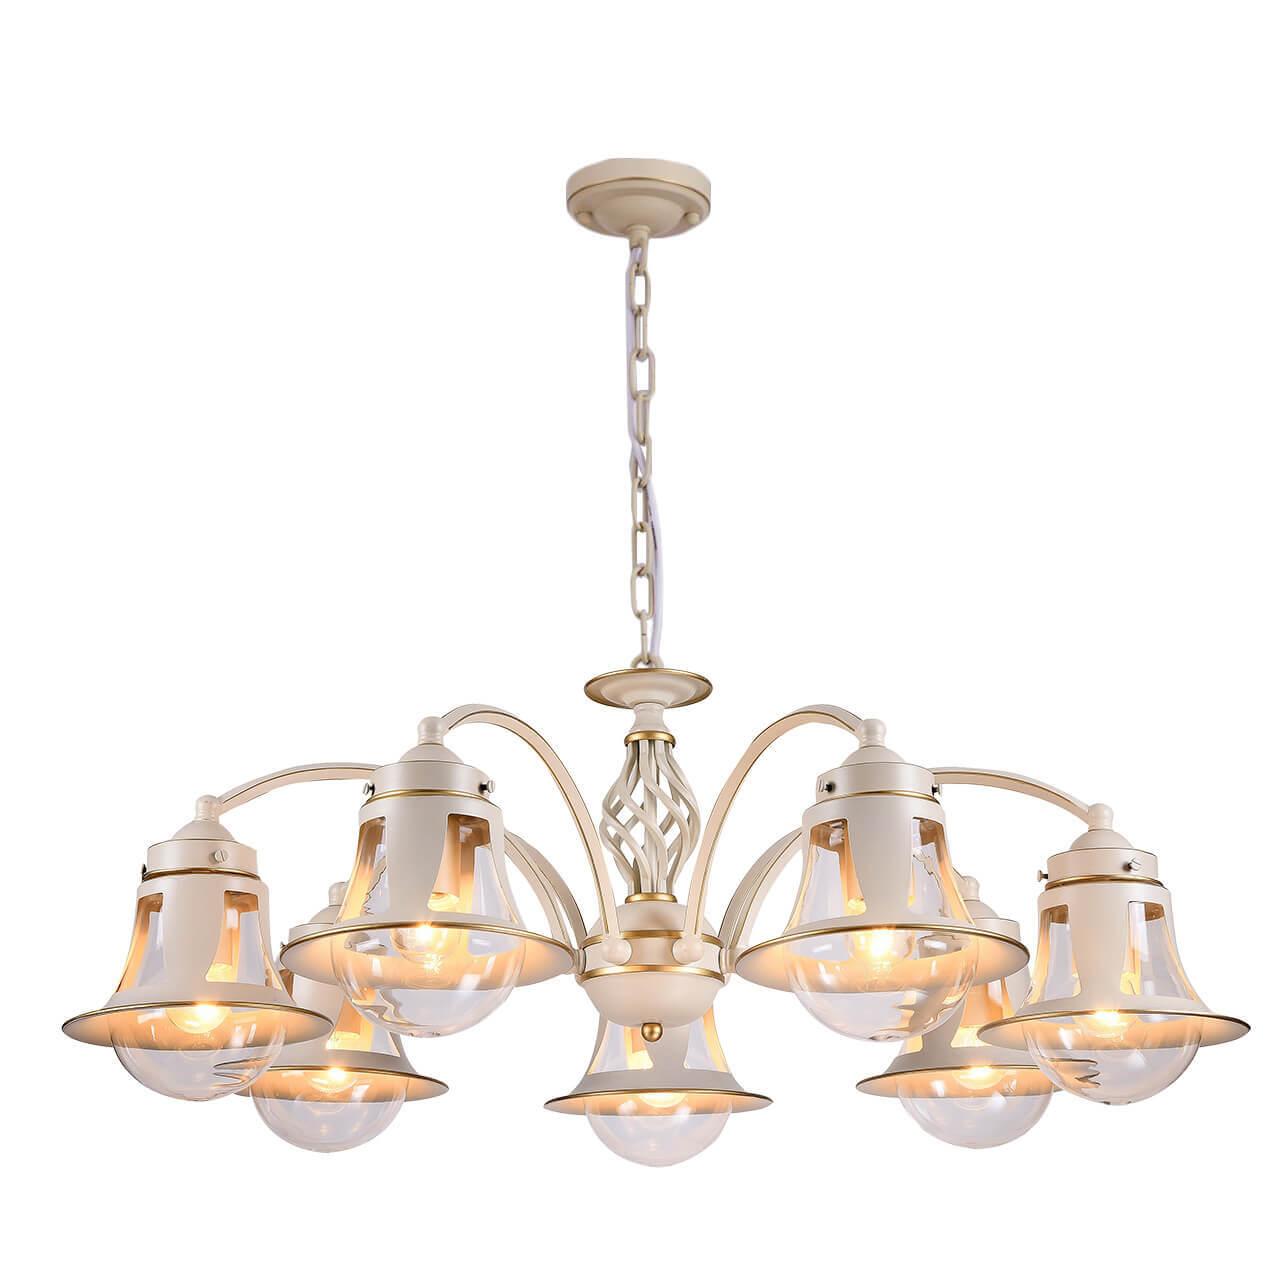 Люстра Arte Lamp A7022LM-7WG 7022 люстра arte lamp lucia a9594lm 7wg